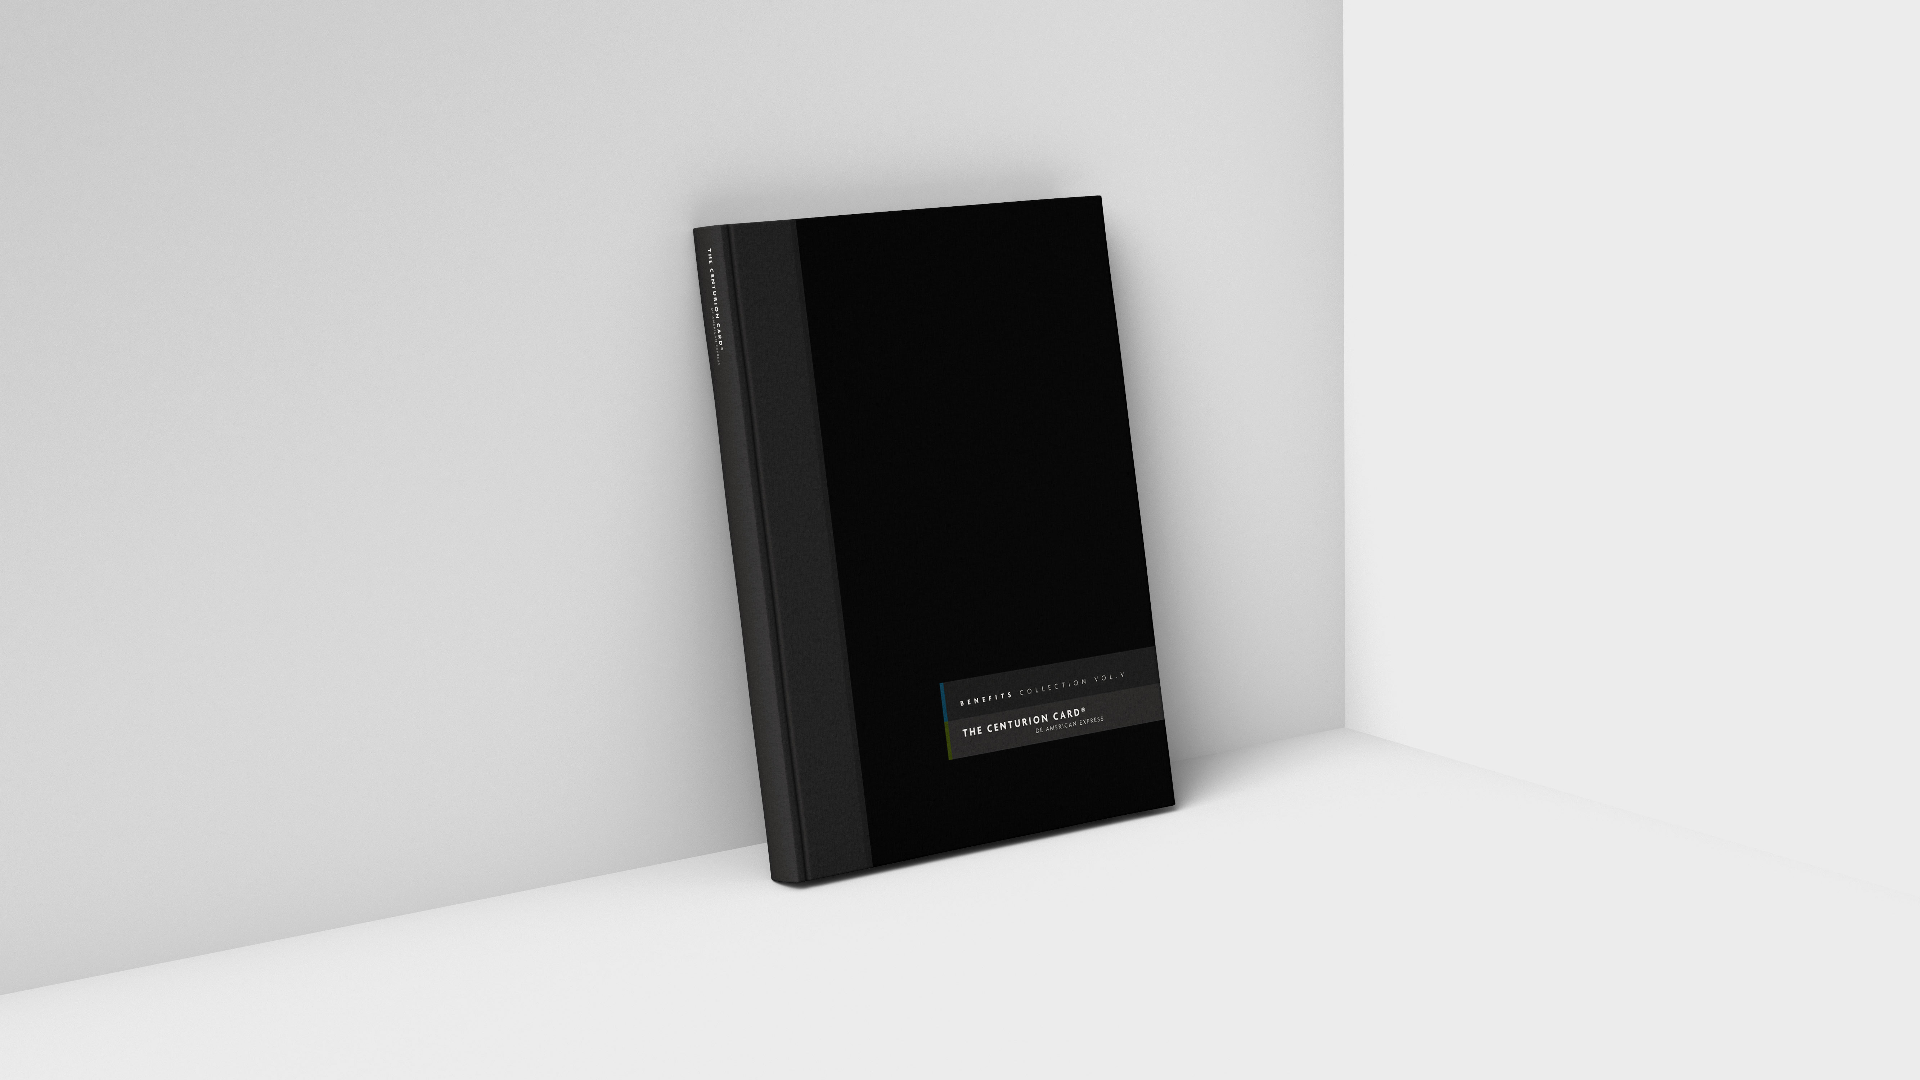 01_amex-centurion_black_book